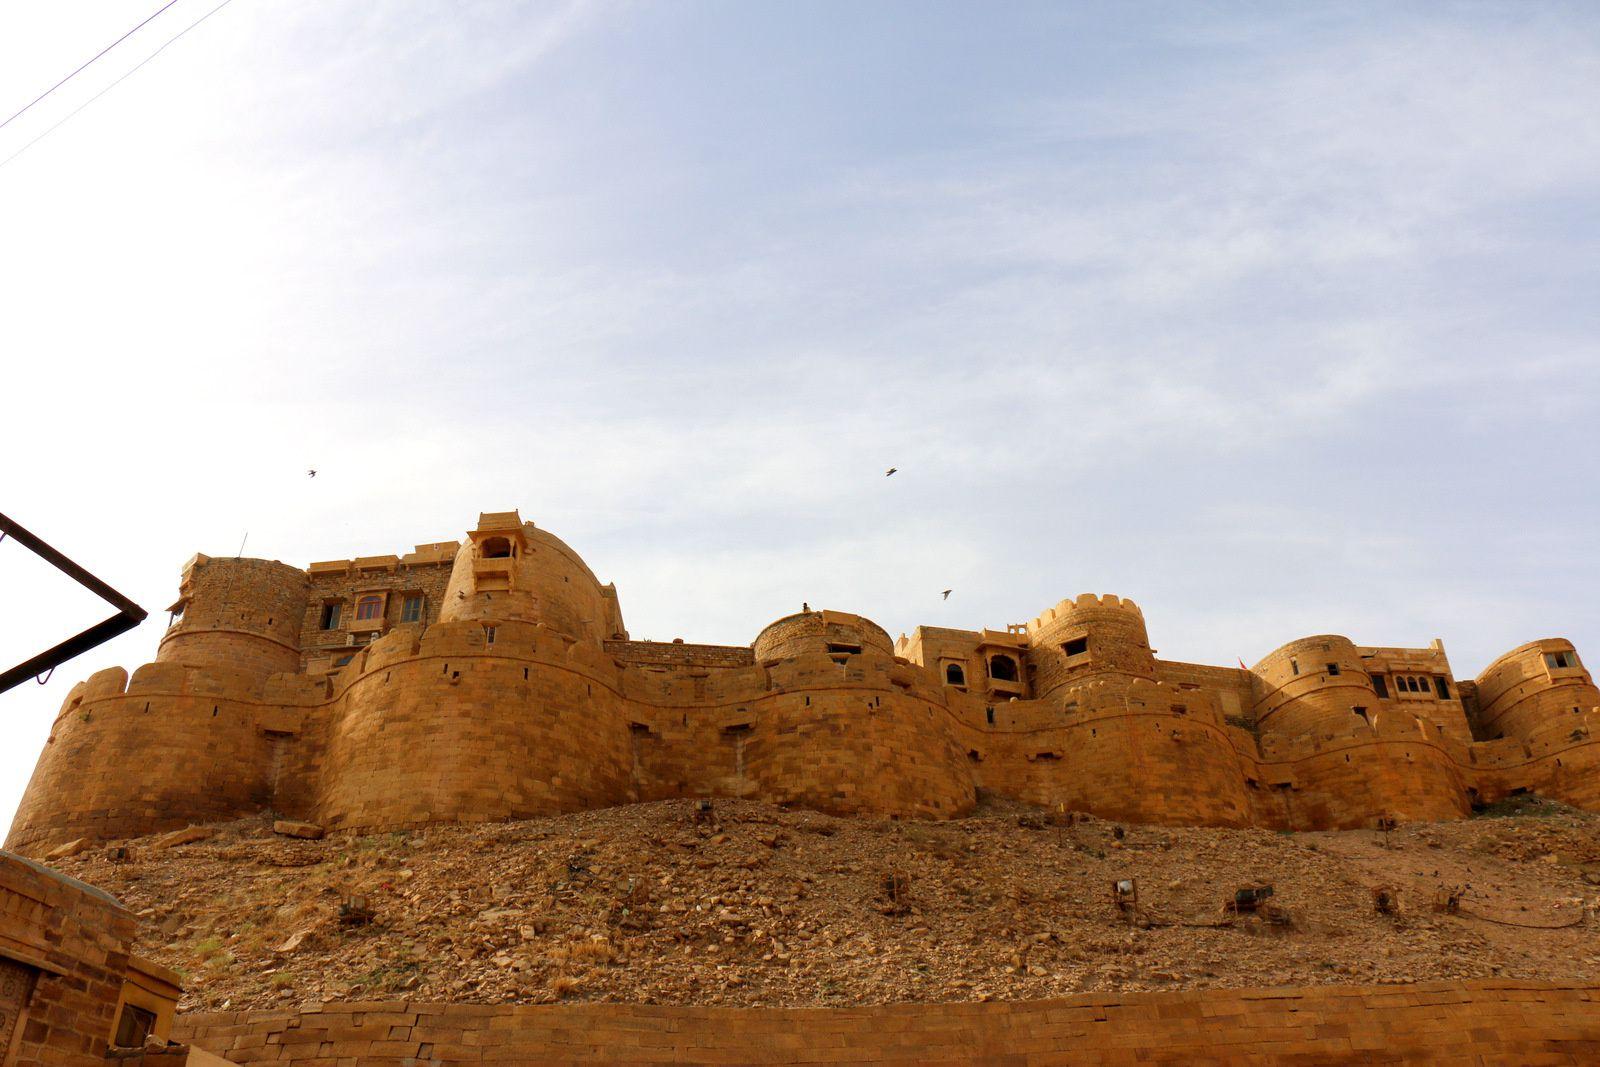 Au pied de la citadelle de Jaisalmer